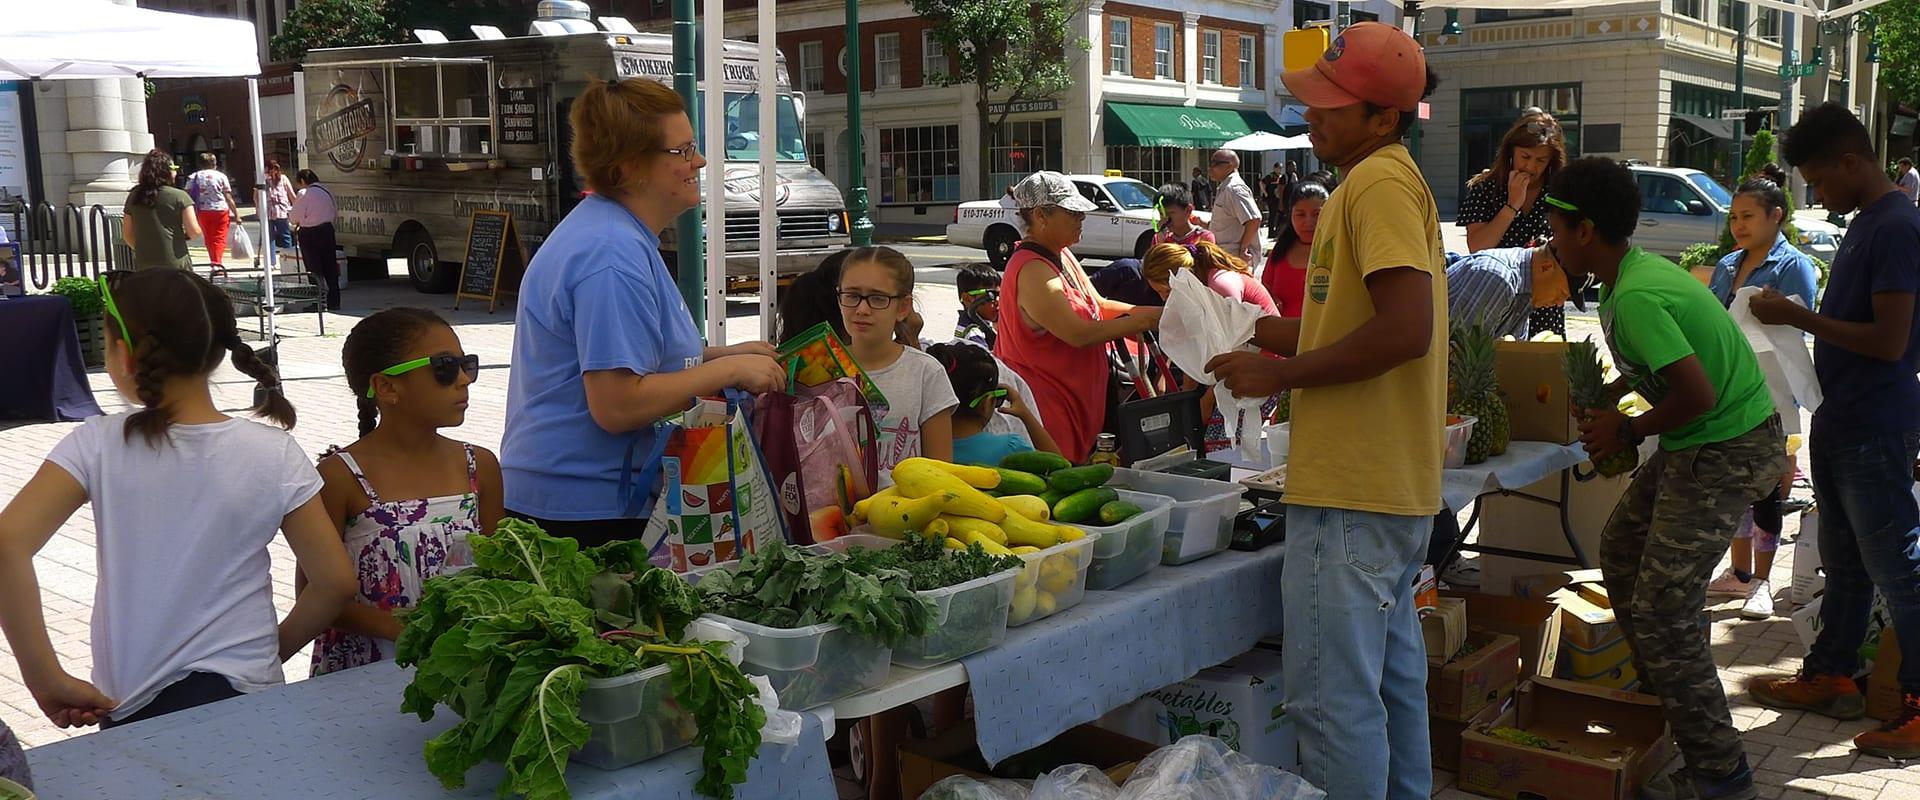 Shopping At The Penn Street Market